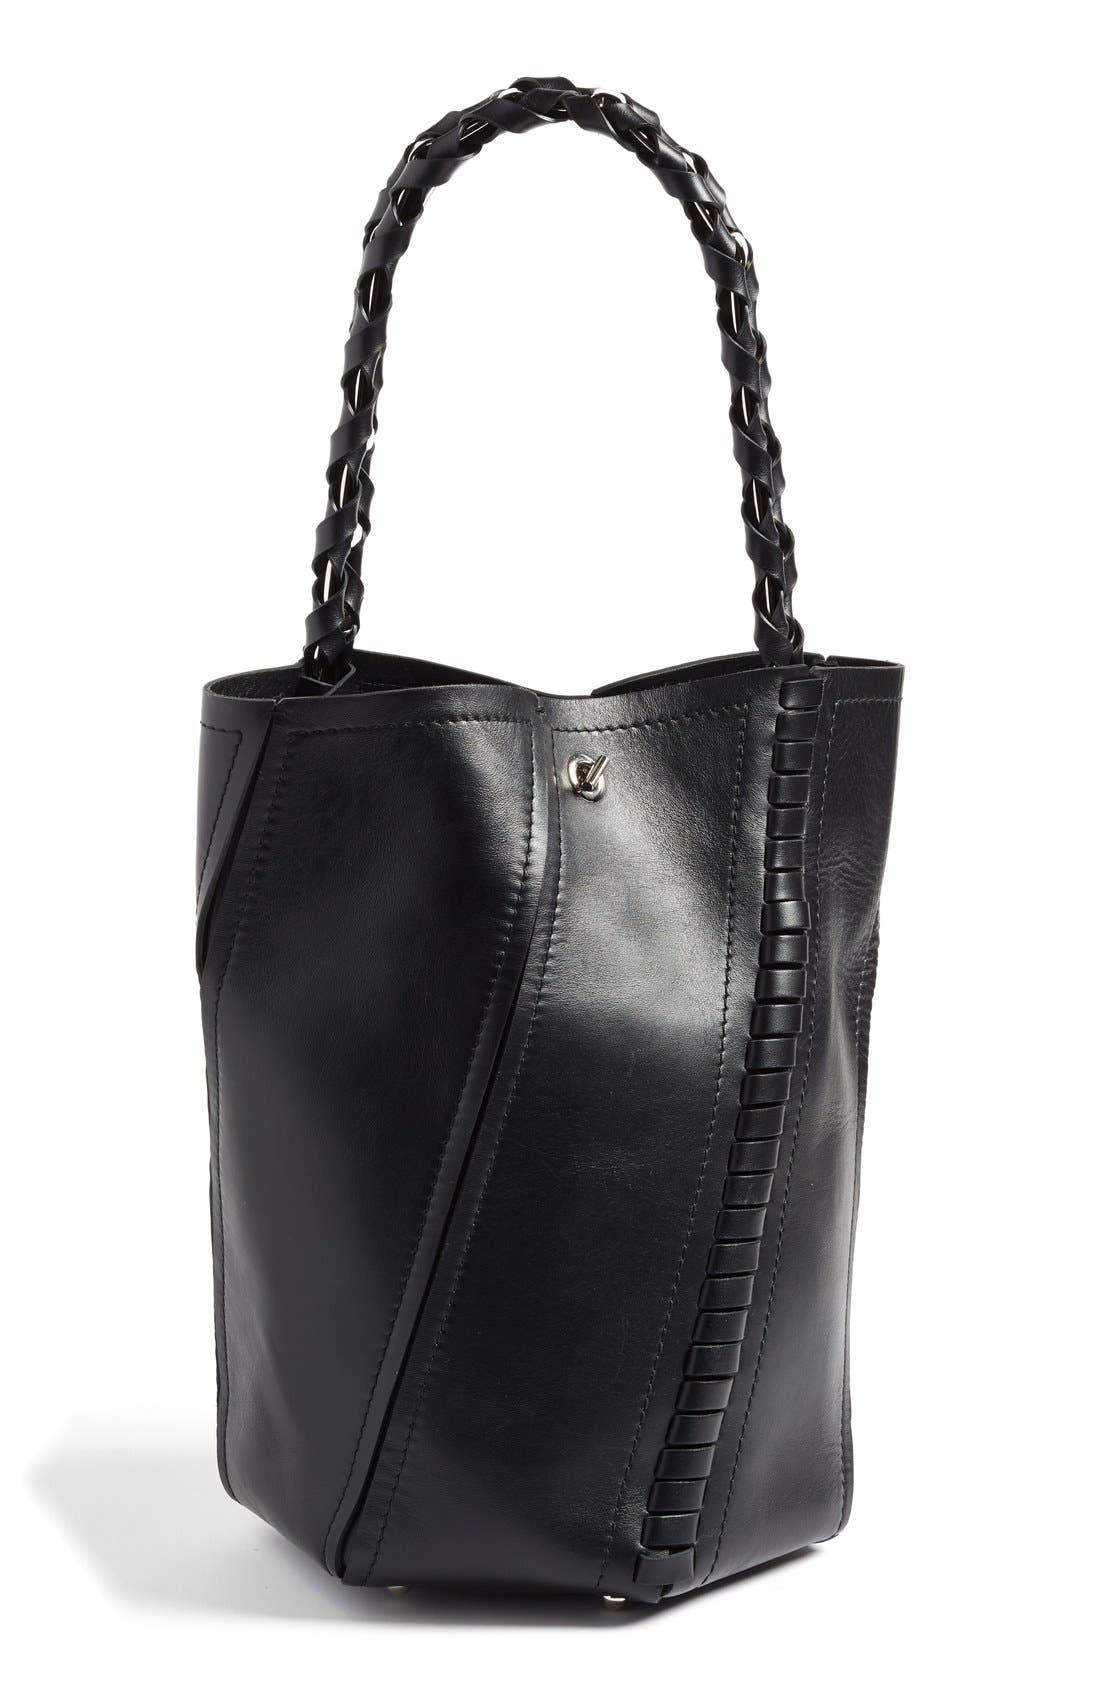 PROENZA SCHOULER, 'Medium Hex' Whipstitch Leather Bucket Bag, Main thumbnail 1, color, BLACK